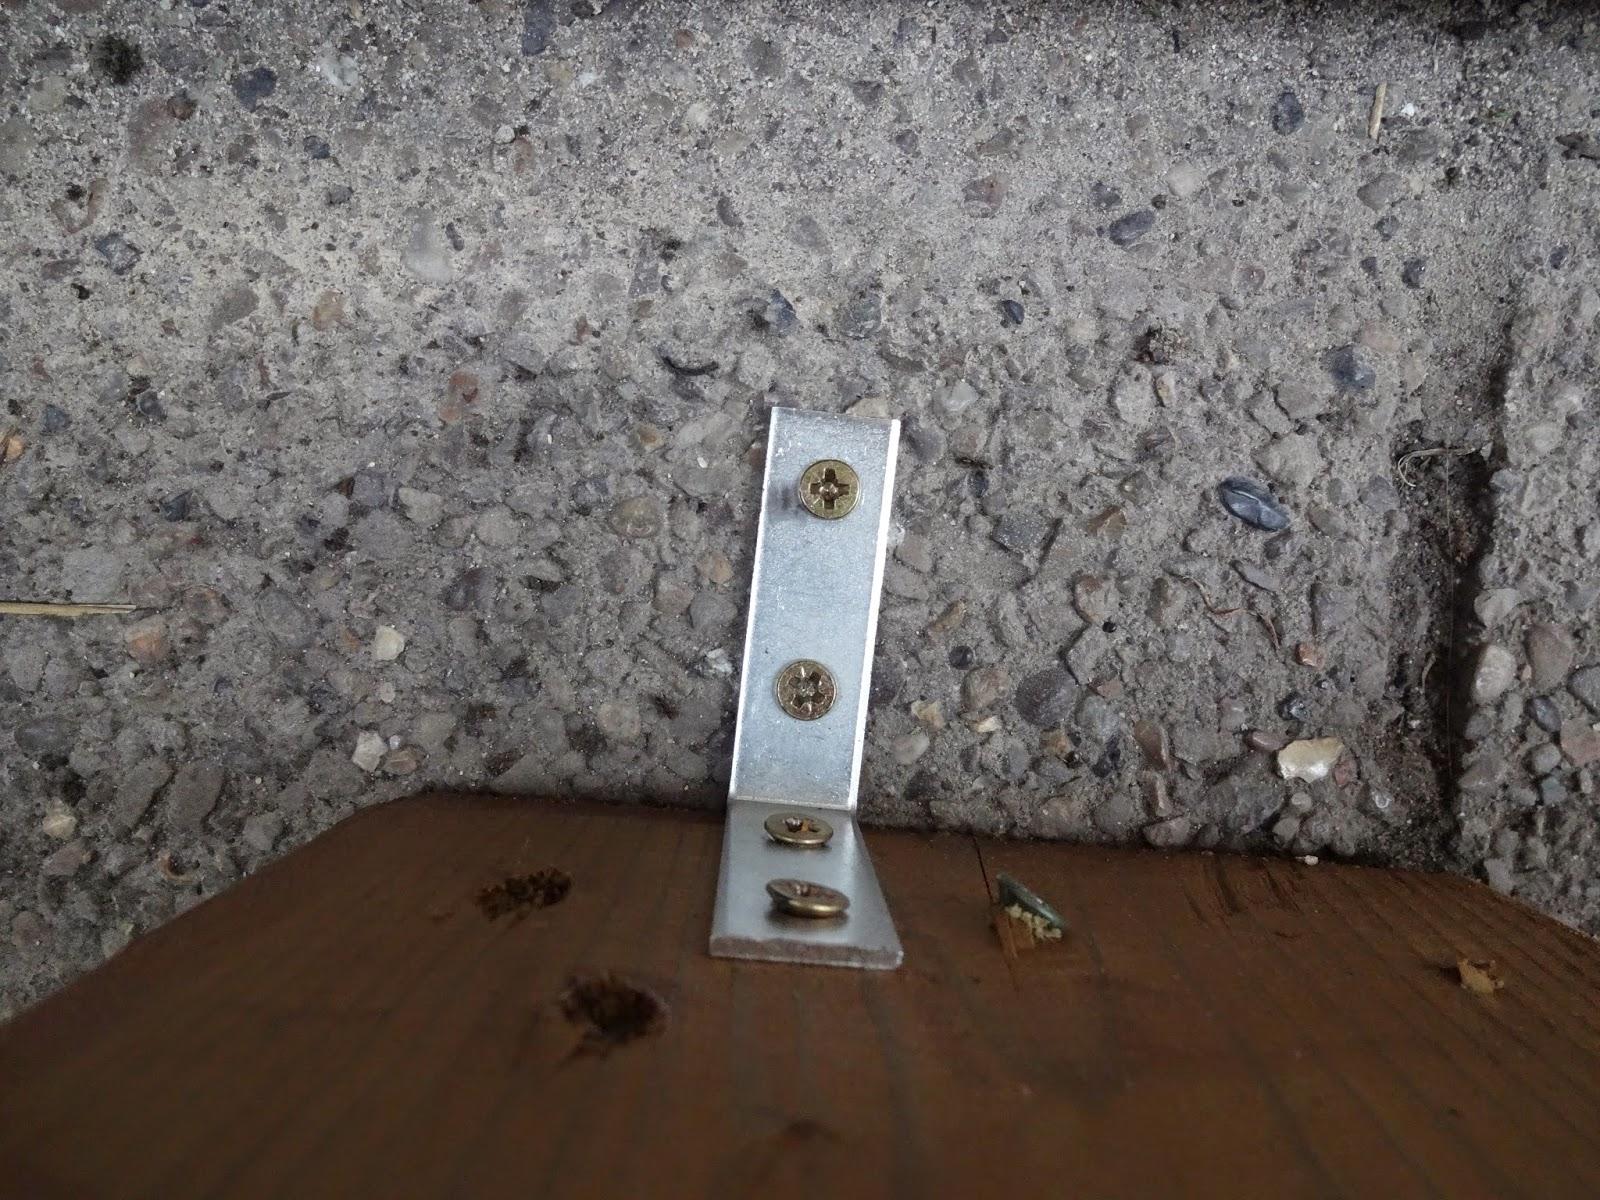 Uk home renovation interiors and diy blog for 4 8 meter decking boards